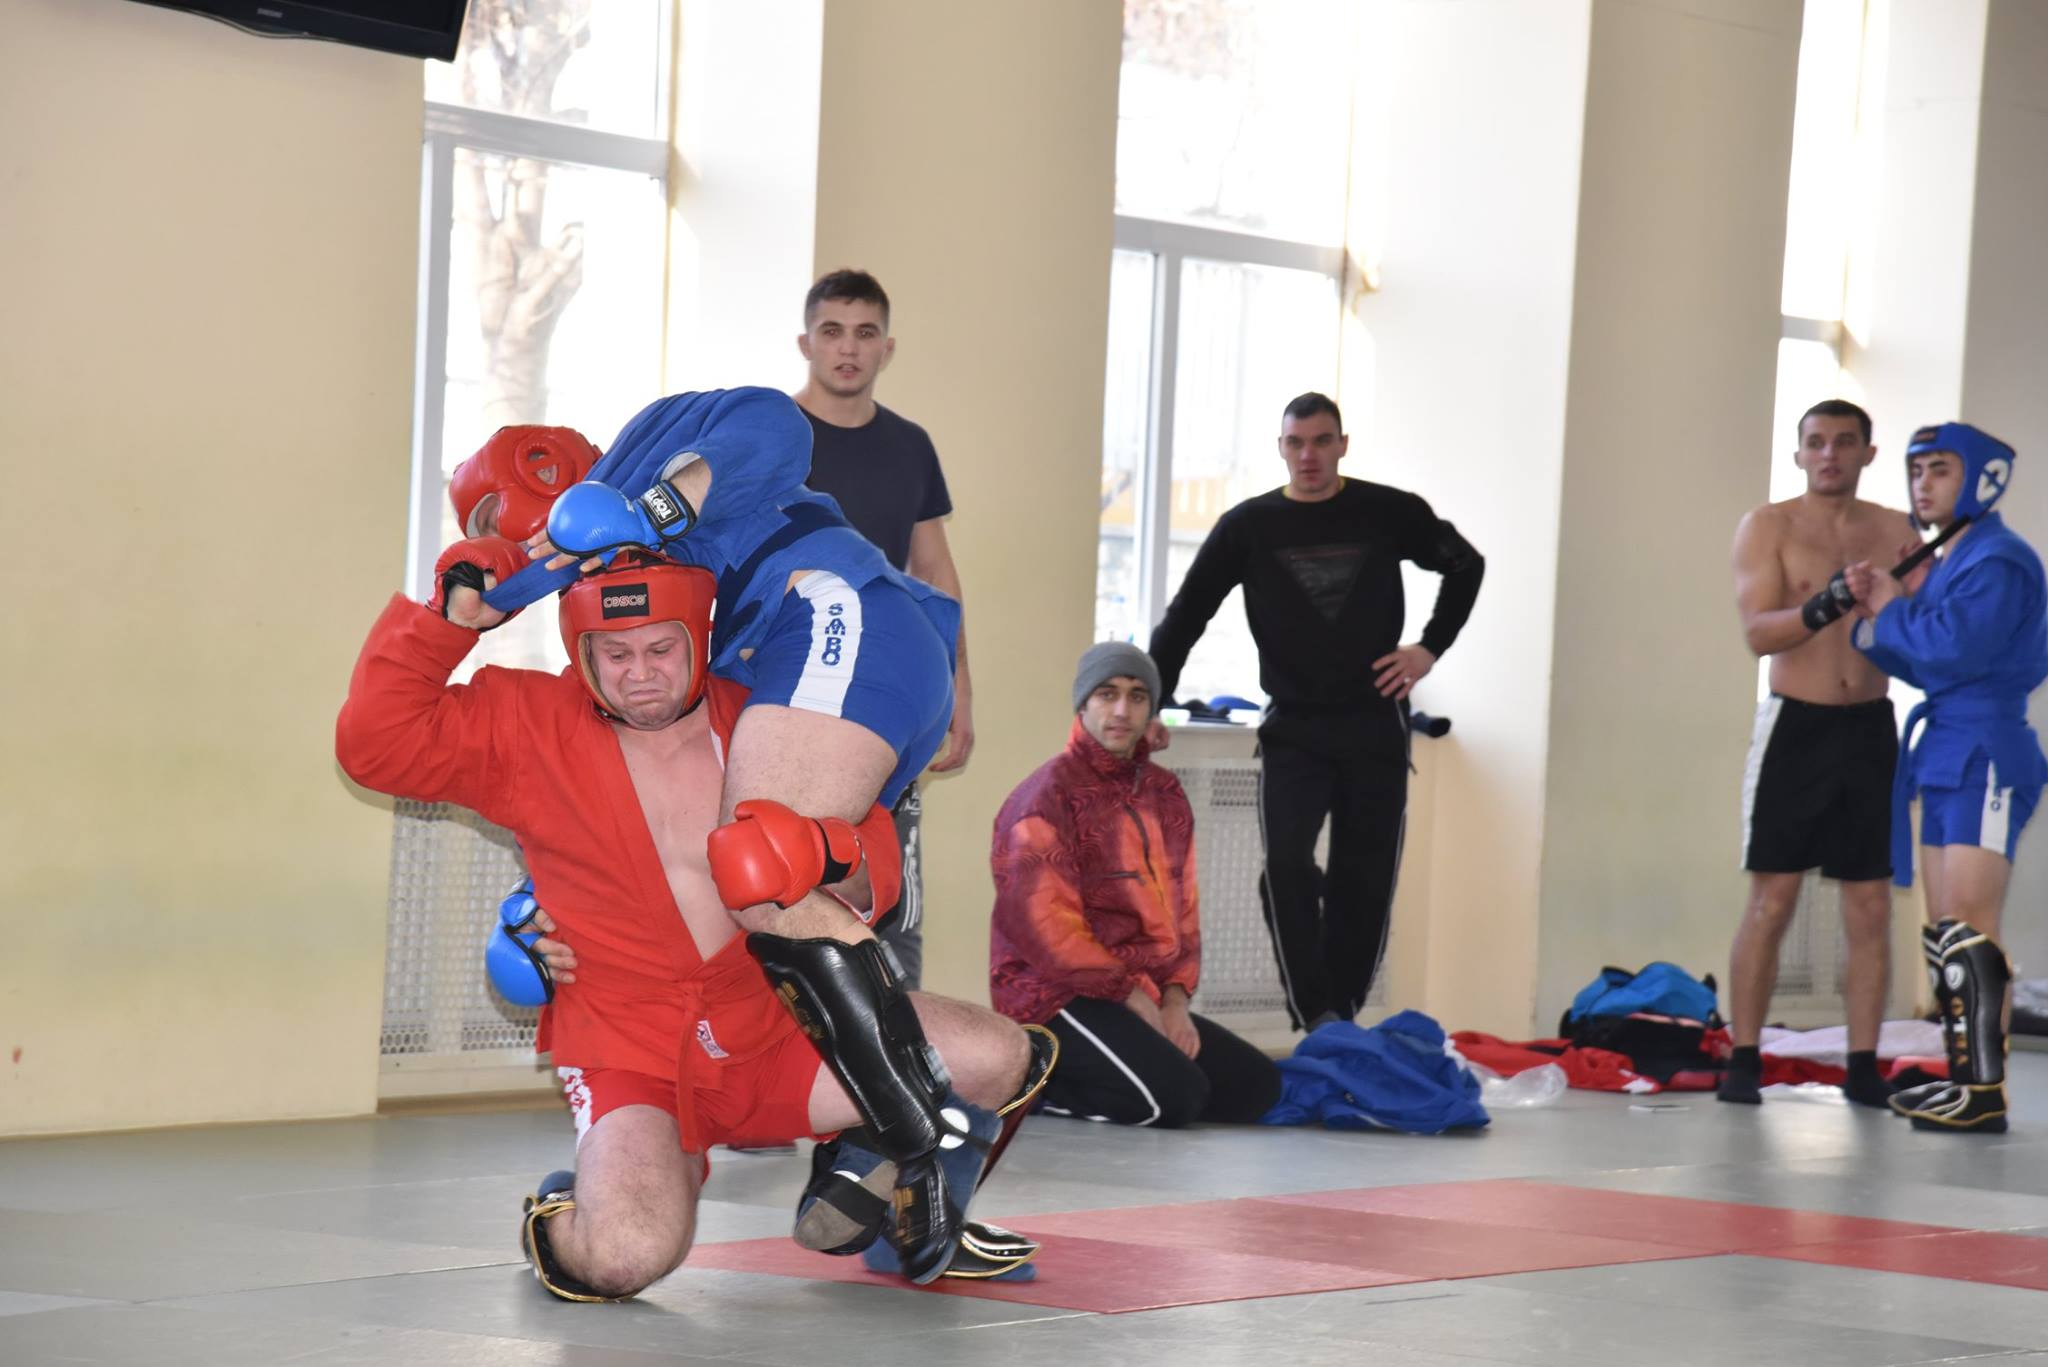 Lupta corp la corp din cadrul Spartachiadei CSC Dinamo 201824